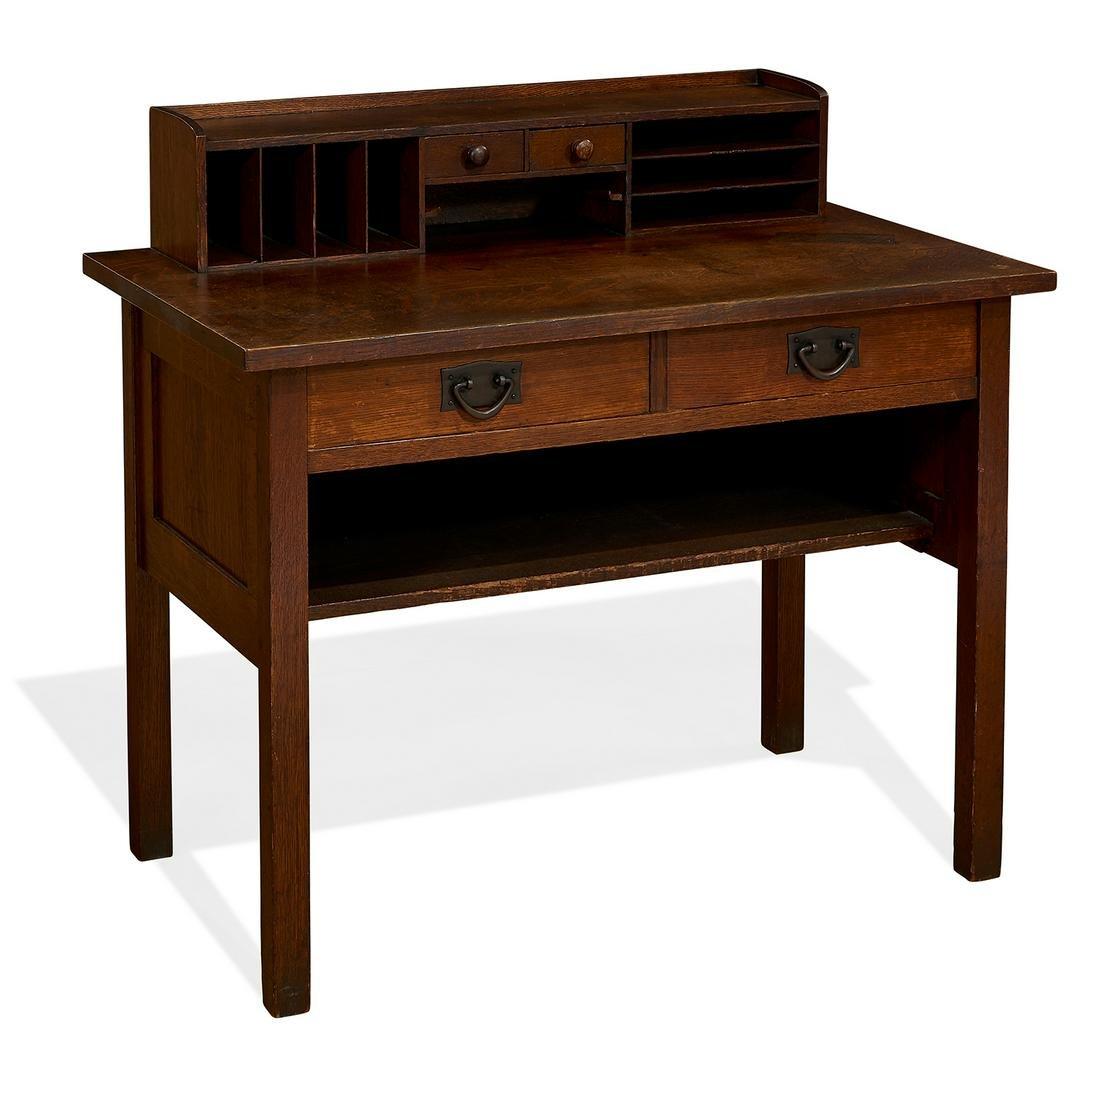 Gustav Stickley desk, #720